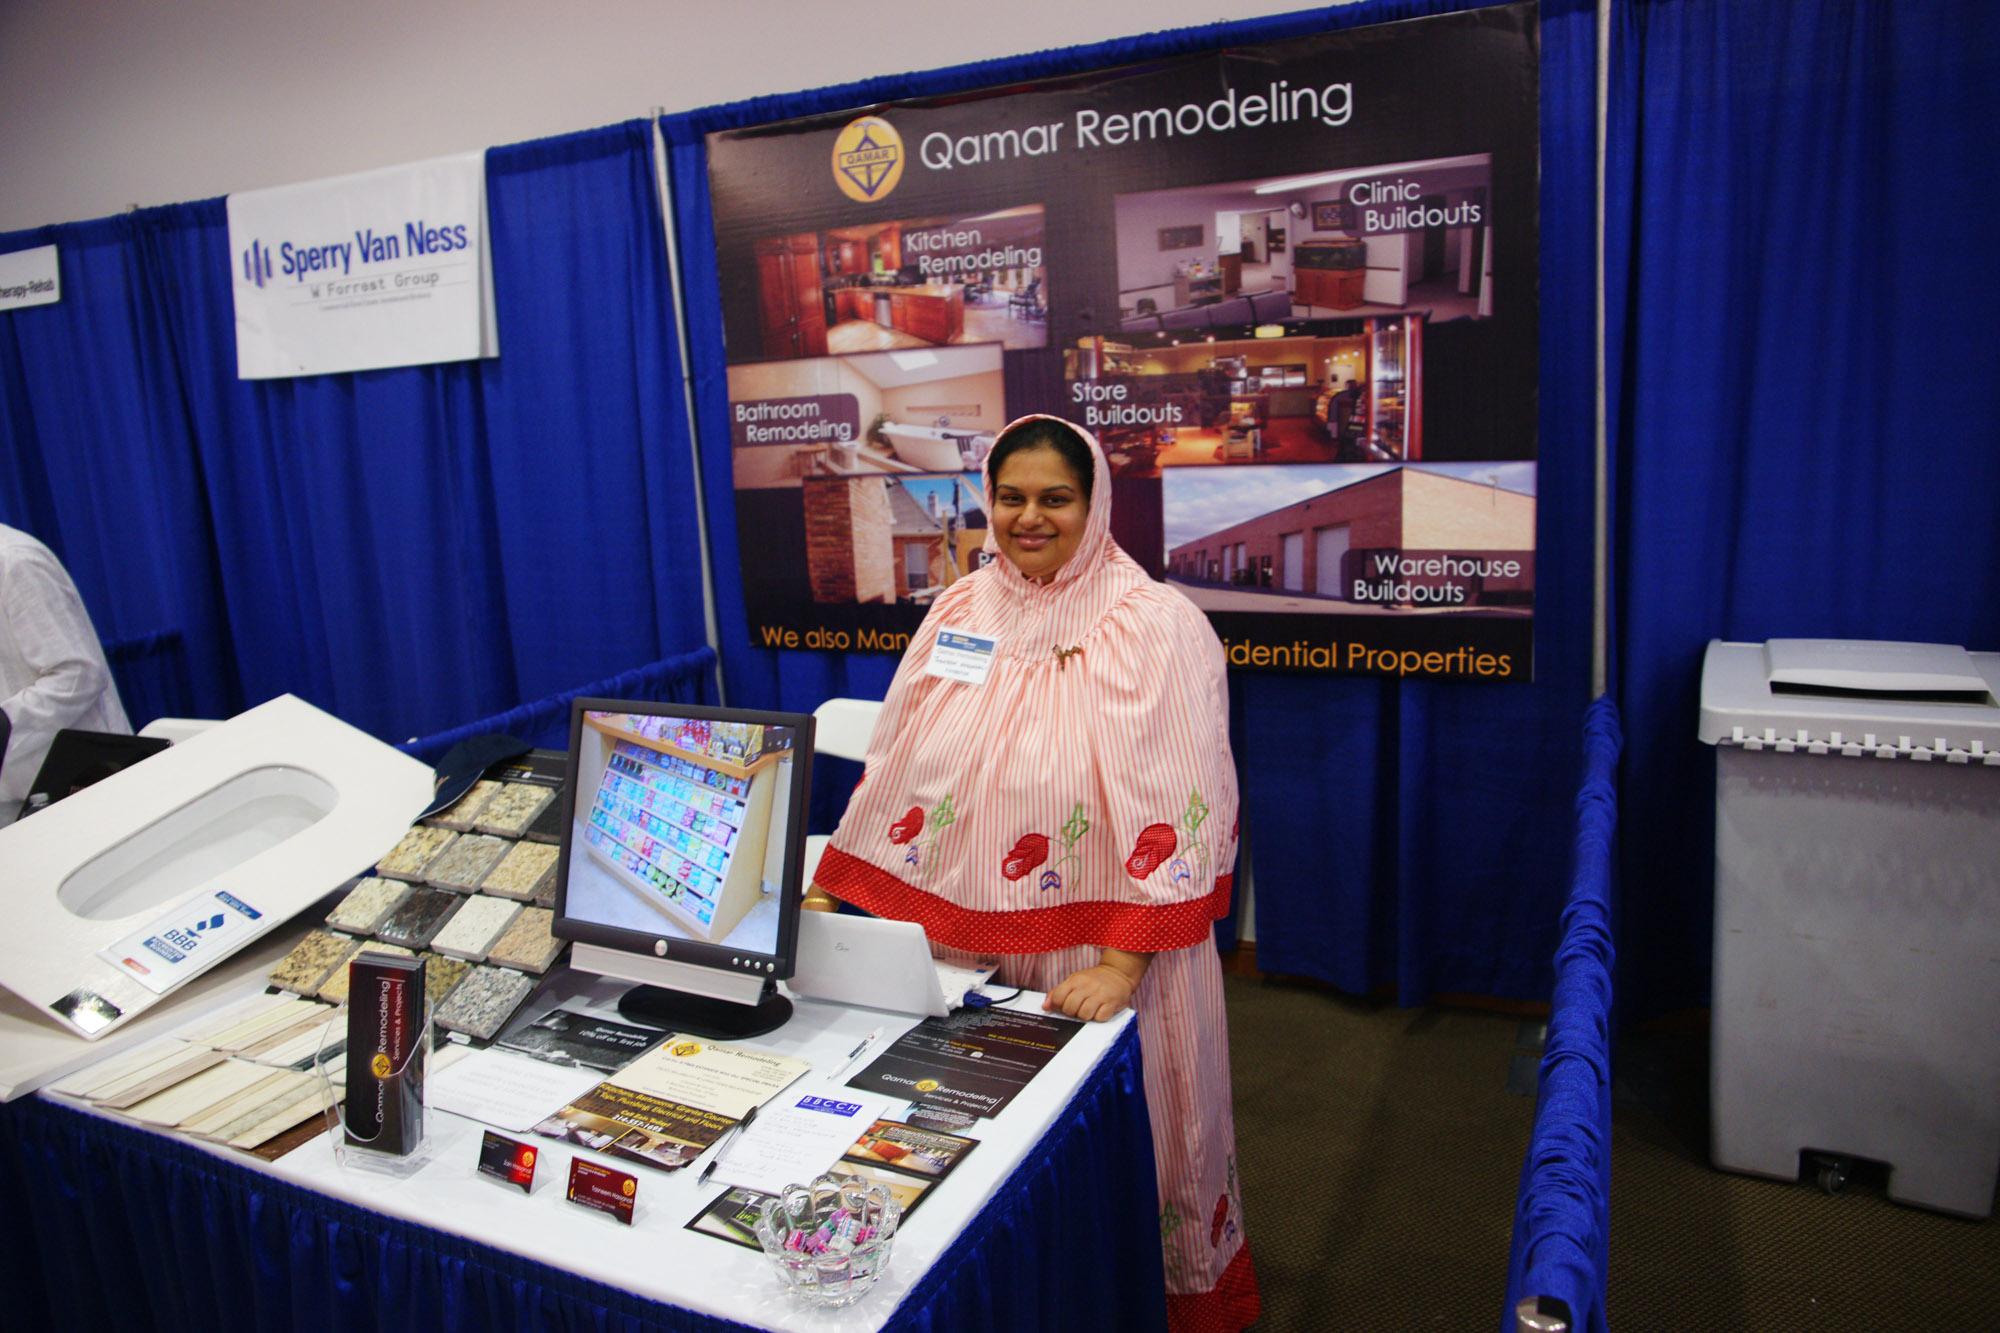 BBCC Houston Business Expo 2011 album-16975646-downloads-pt3-57.JPG